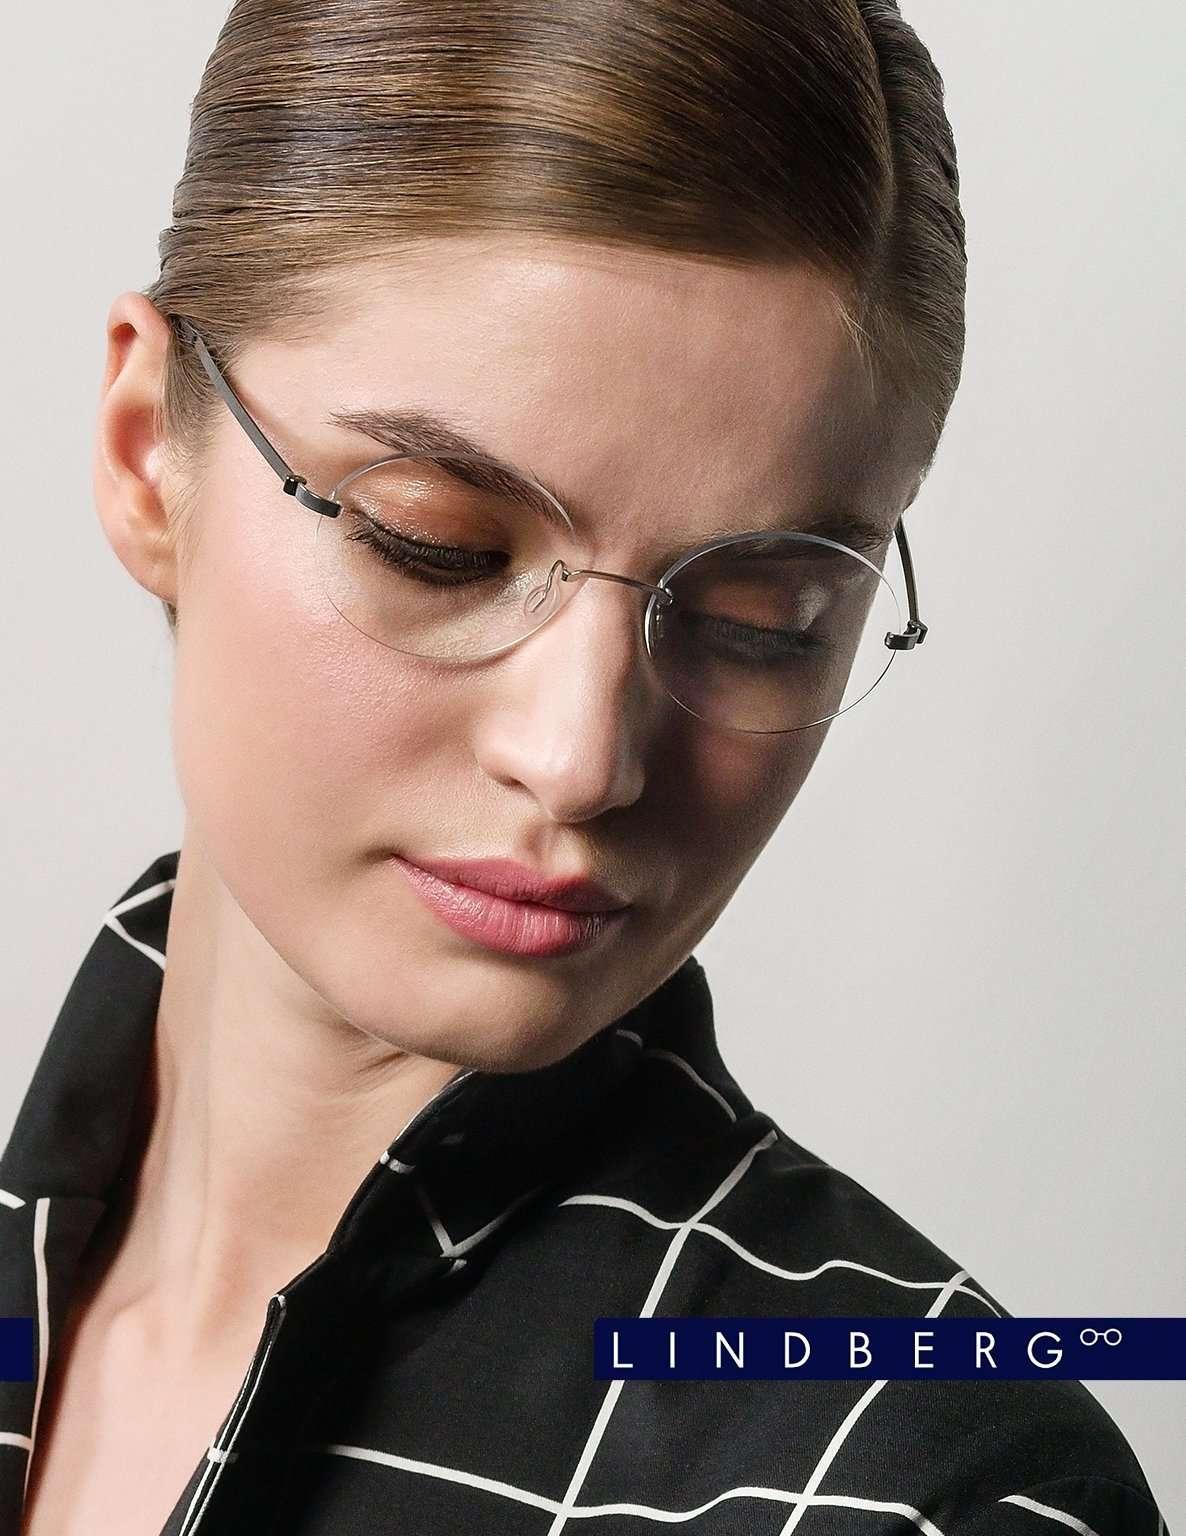 Lindberg rimless frames